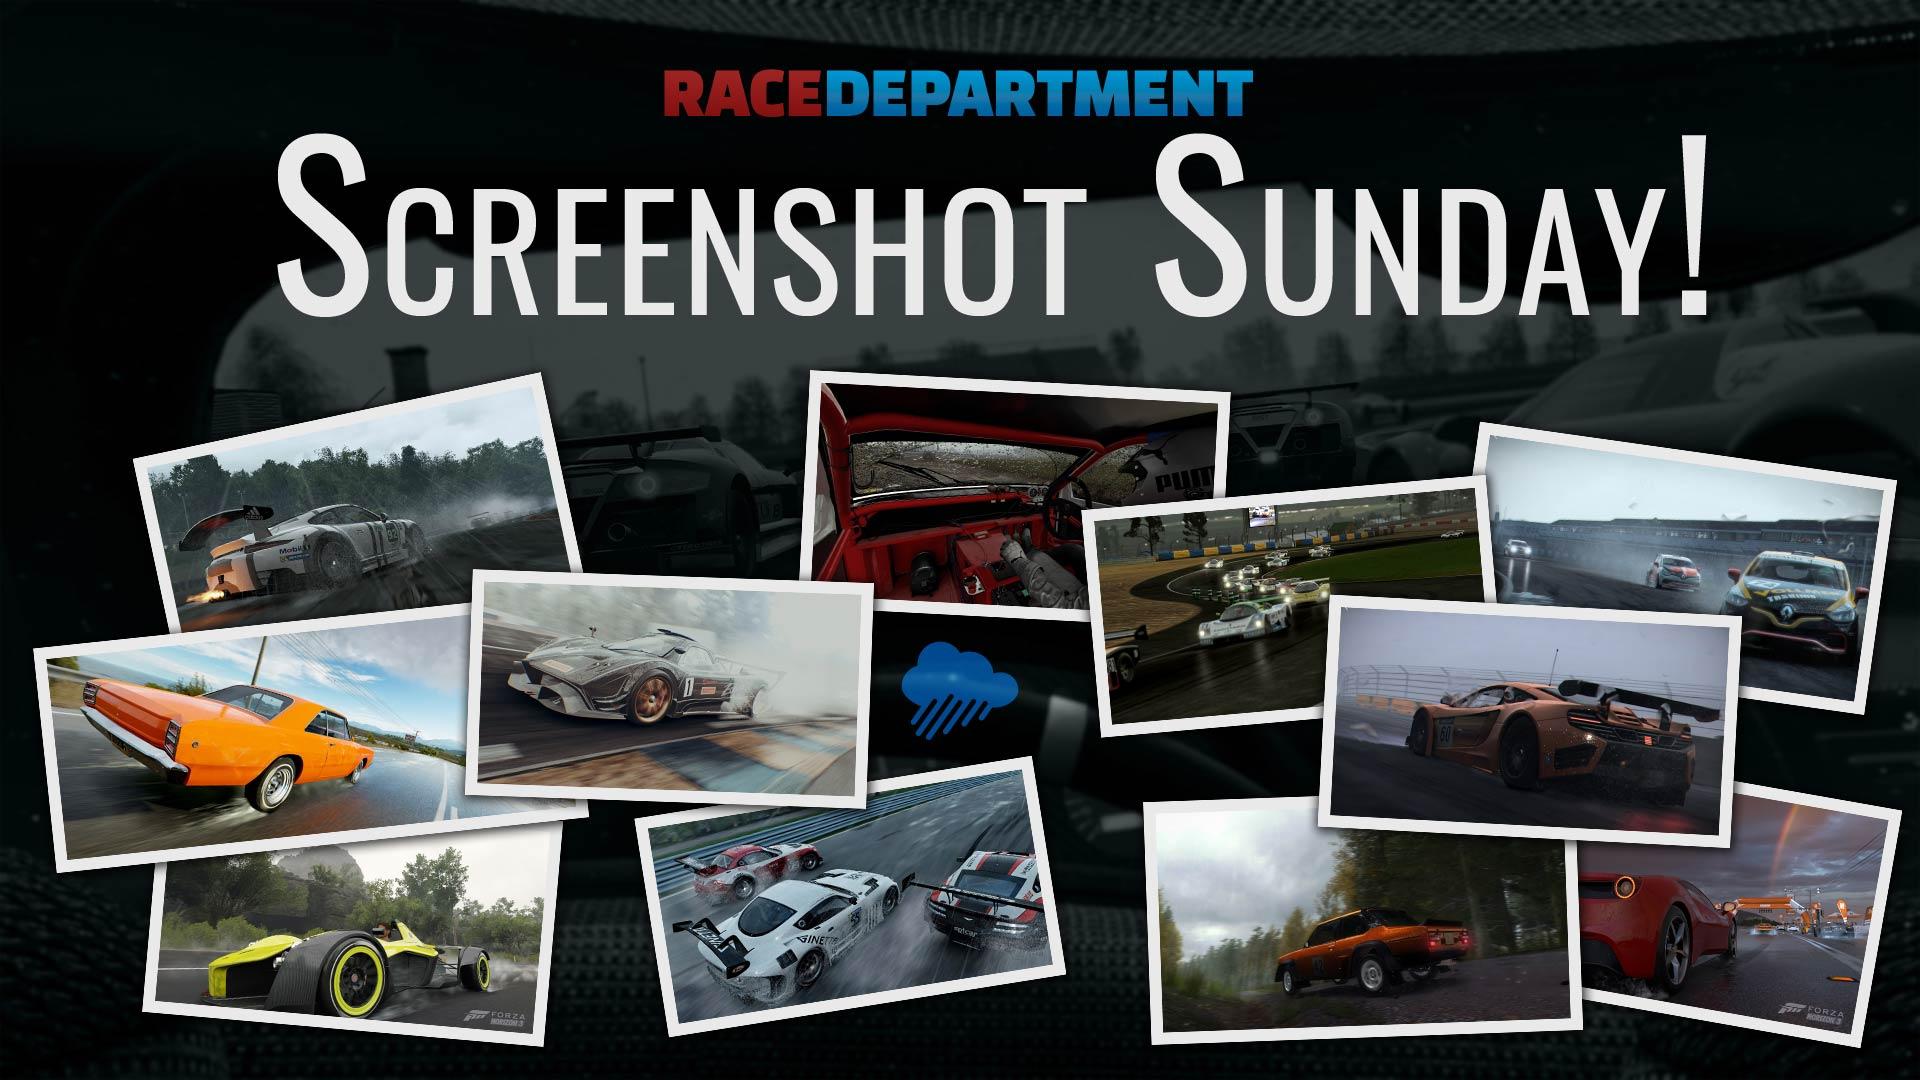 Screenshot Sunday - Rain.jpg